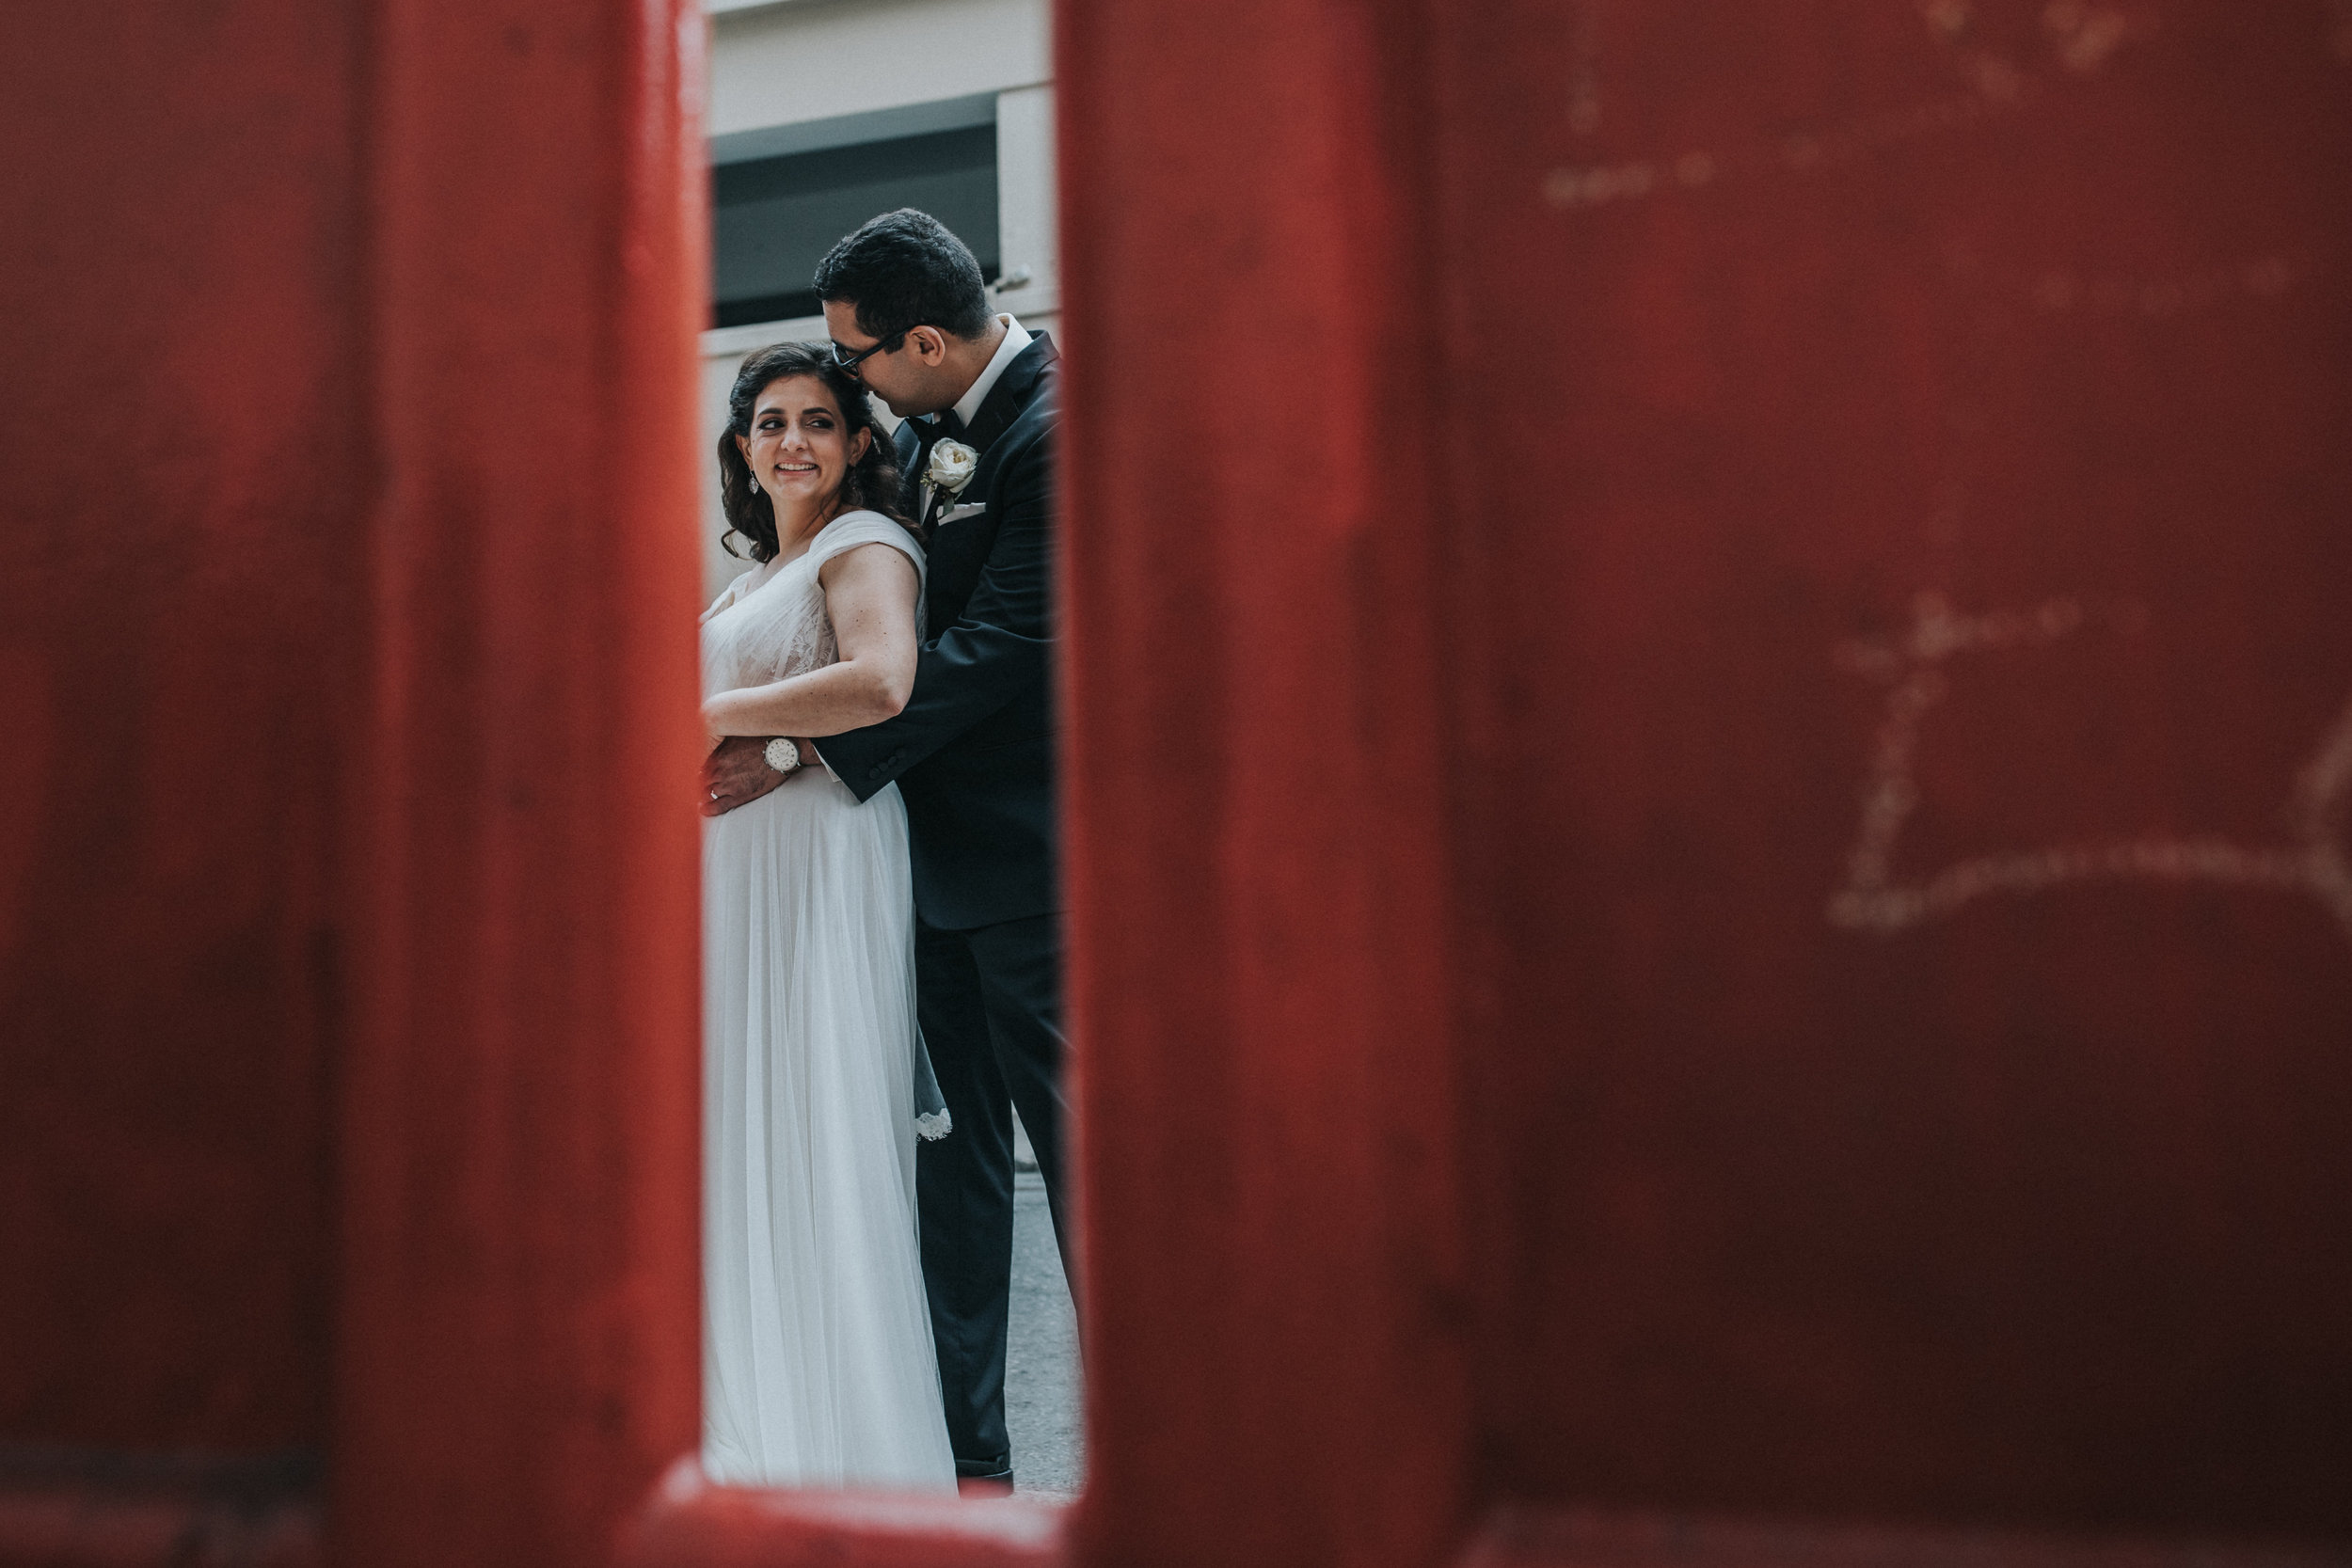 JennaLynnPhotography-NJWeddingPhotographer-Philadelphia-Wedding-ArtsBallroom-BridalParty-51.jpg